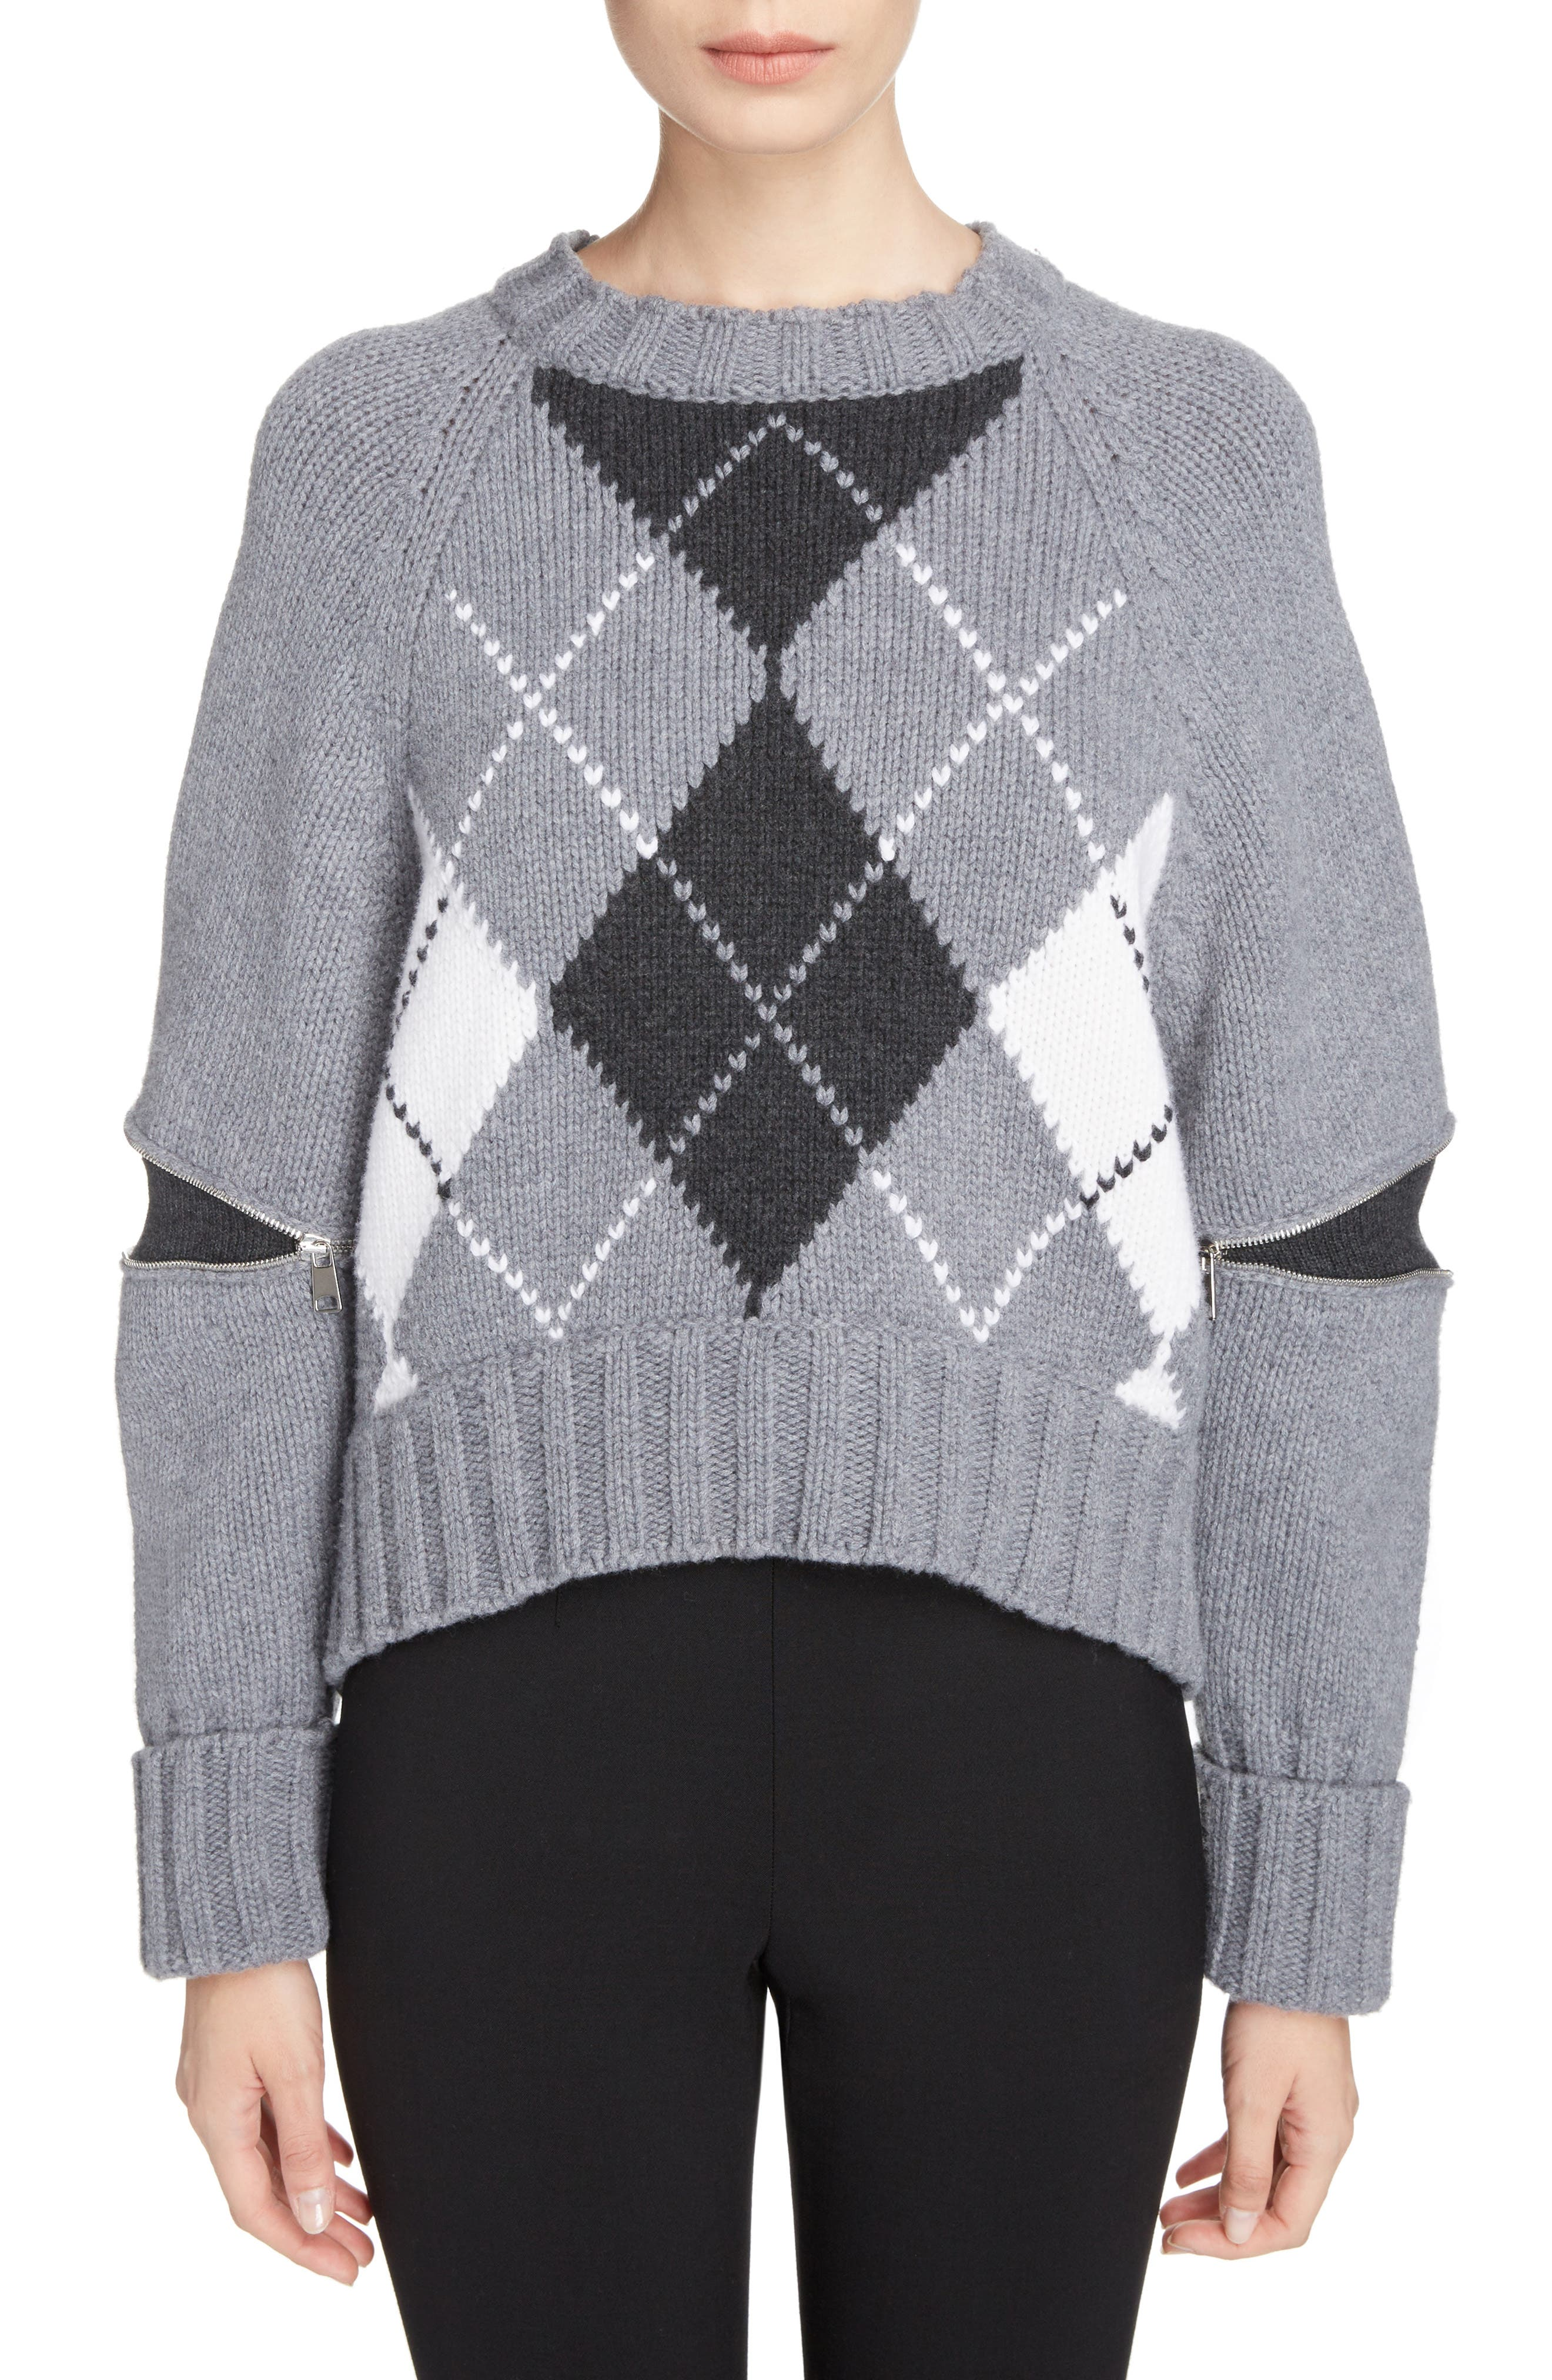 Alternate Image 1 Selected - Alexander McQueen Zip Sleeve Wool Argyle Sweater